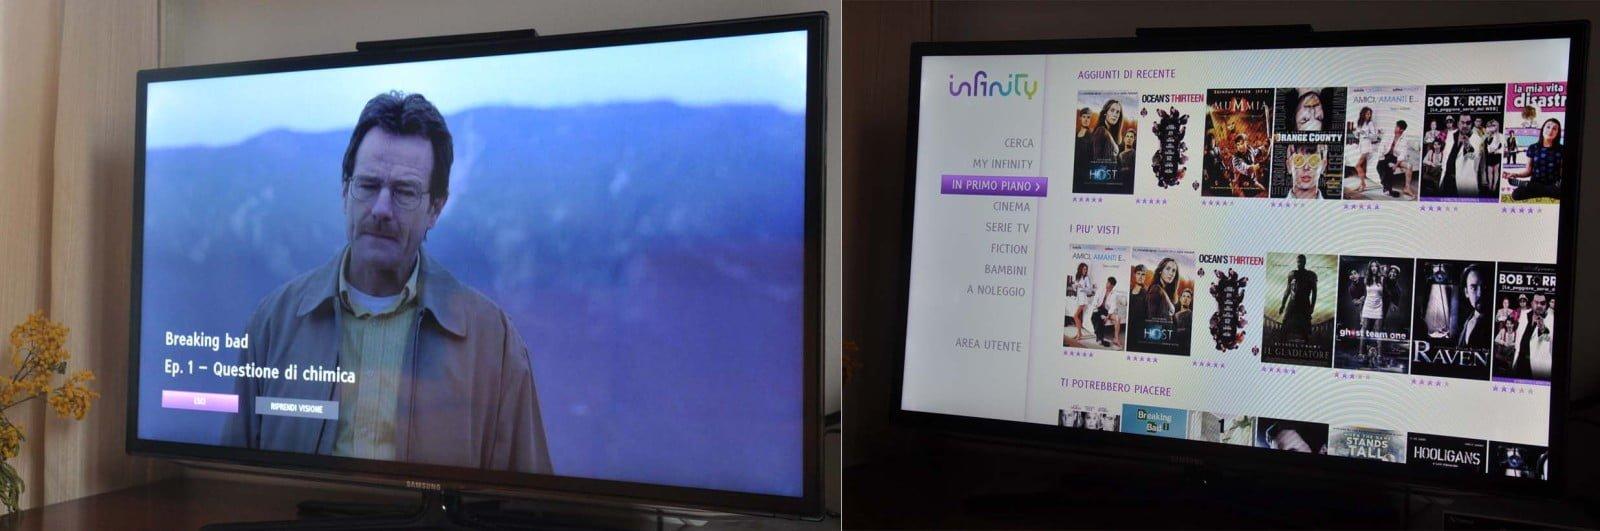 Infinity App per Samsung Smart TV